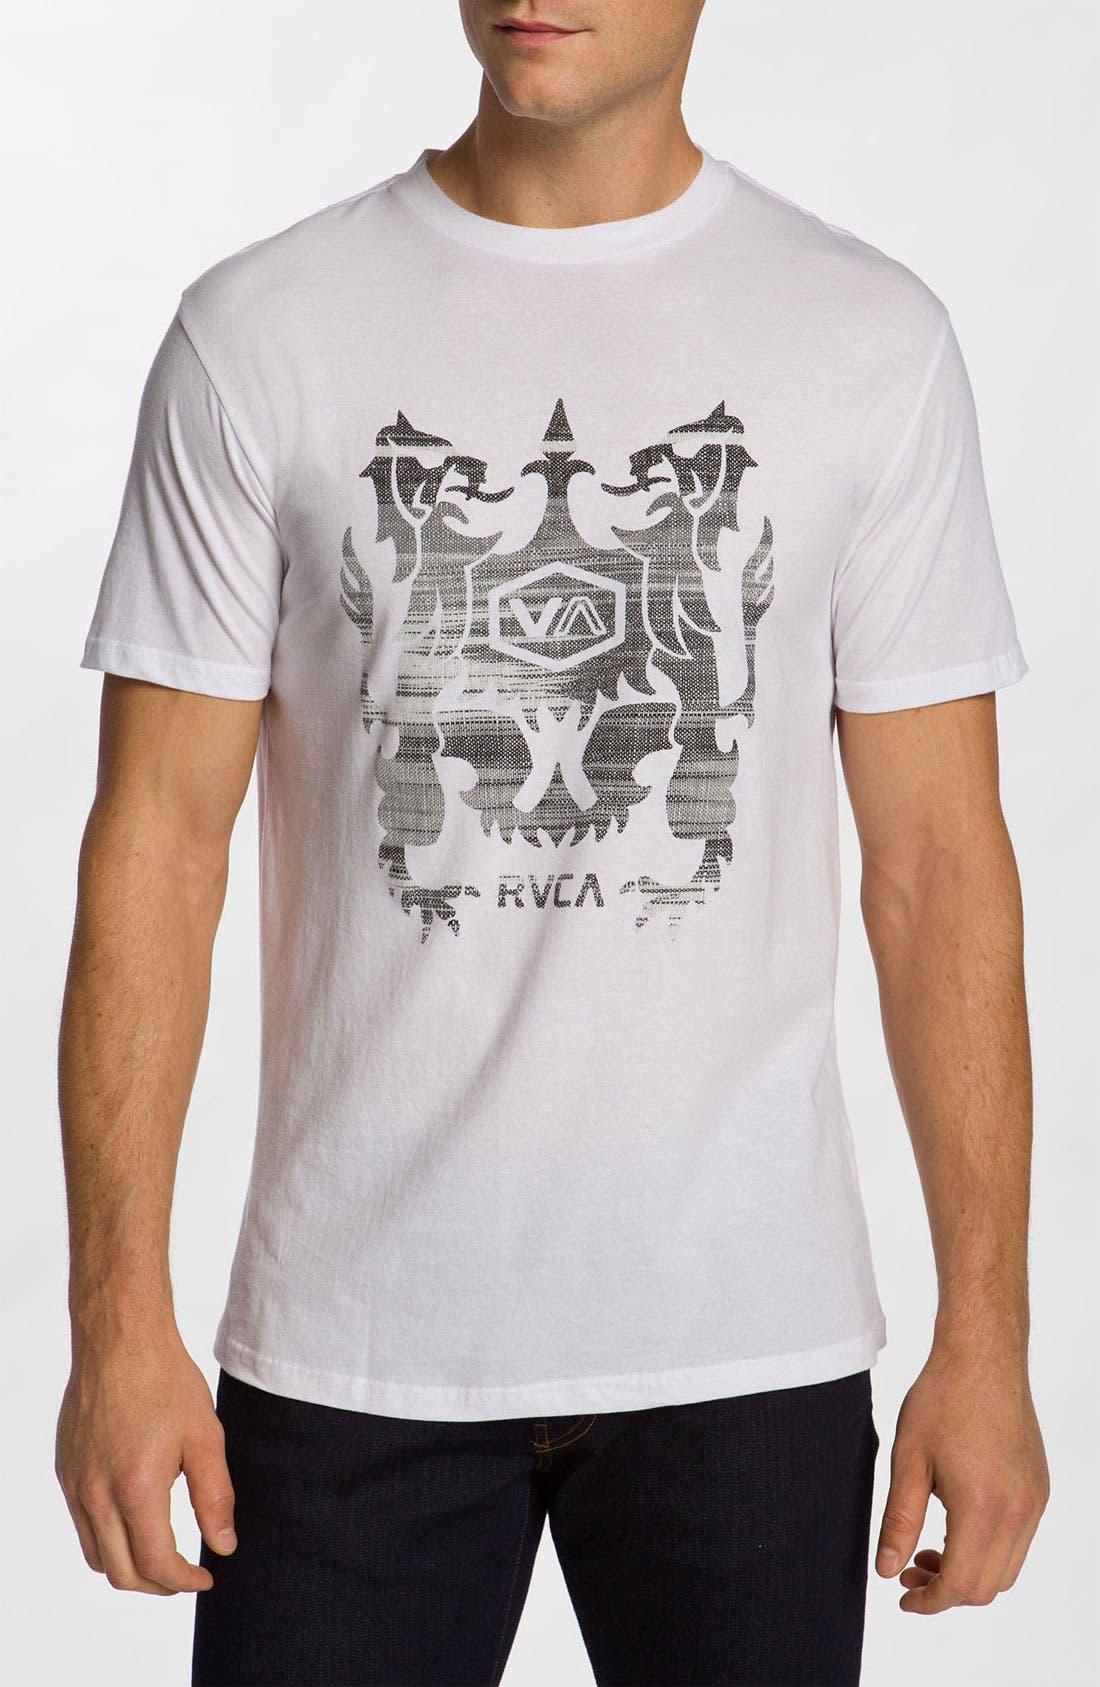 Alternate Image 1 Selected - RVCA 'Eecat Crest' T-Shirt